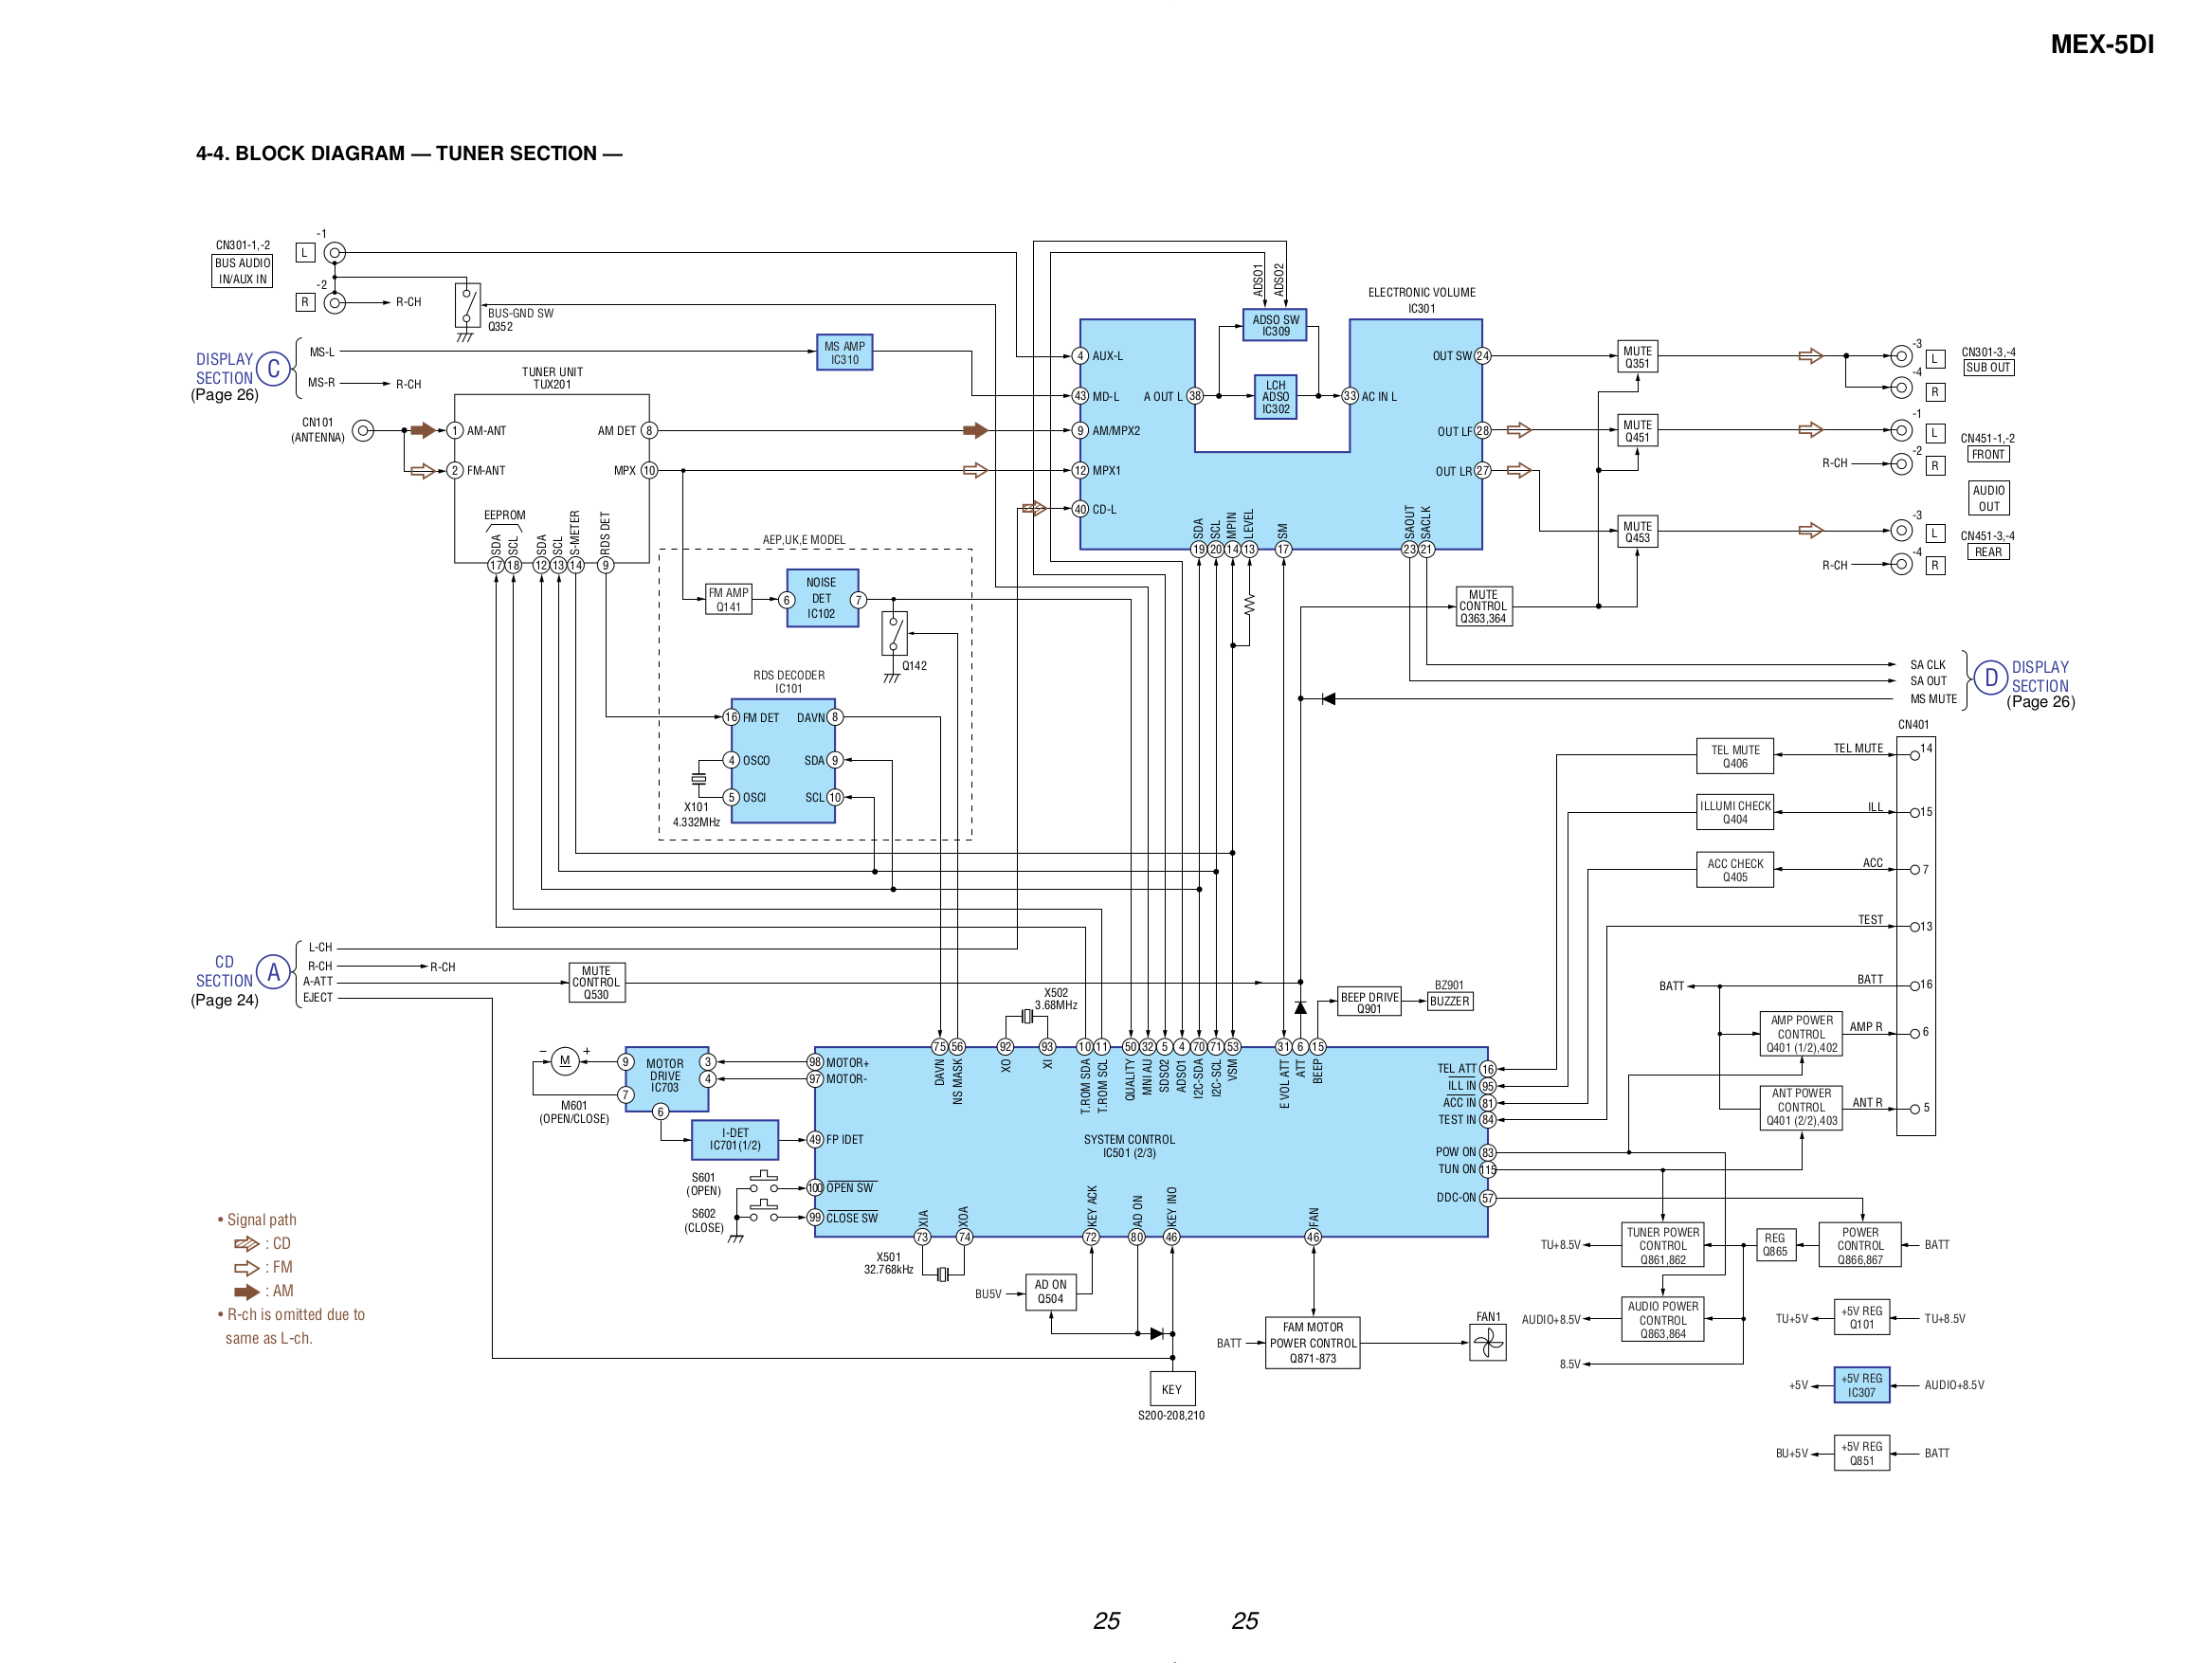 ... Sony Car Receiver MEX-5DI pdf page preview ...